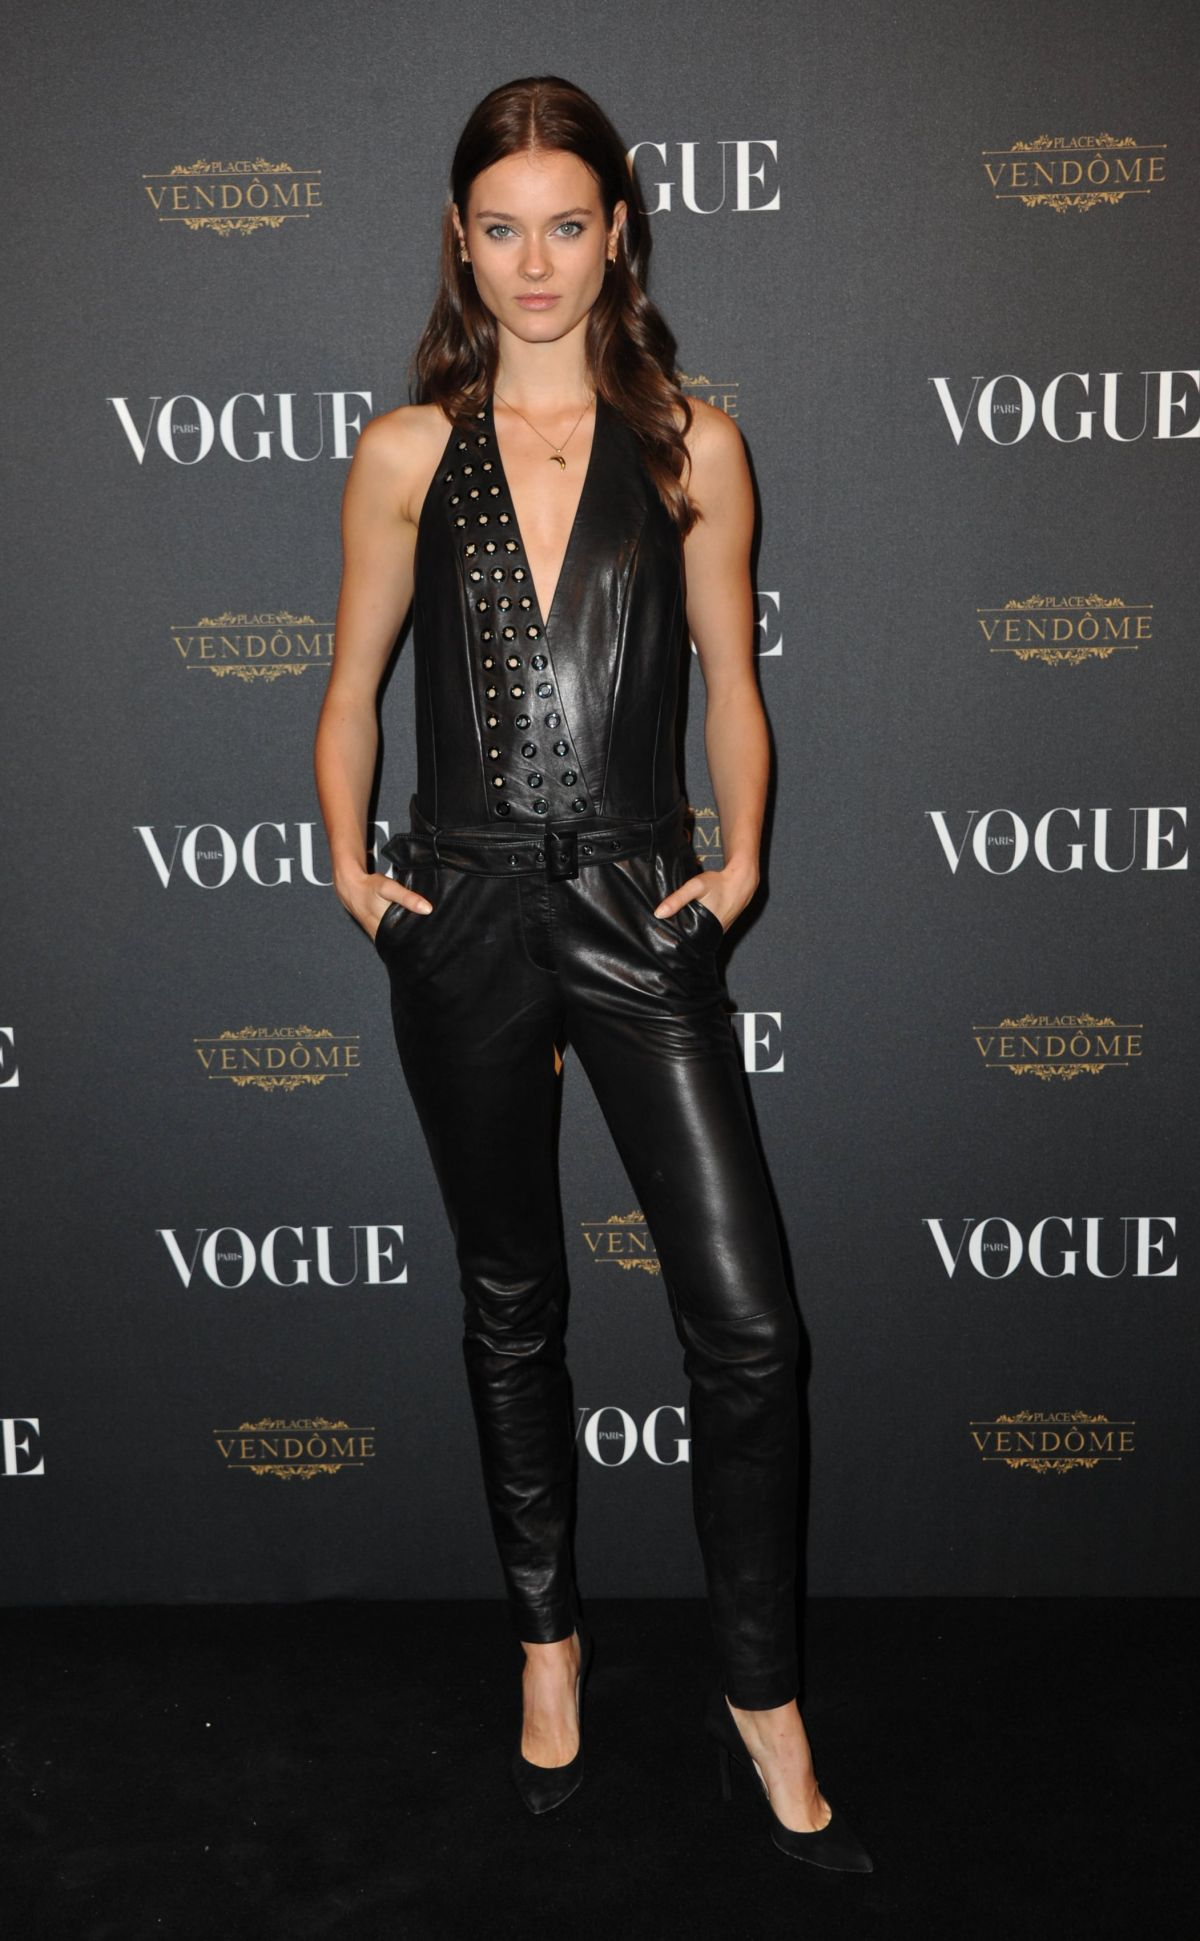 MONIKA JAGACIAK at Vogue's 95th Anniversary Party in Paris 10/03/2015